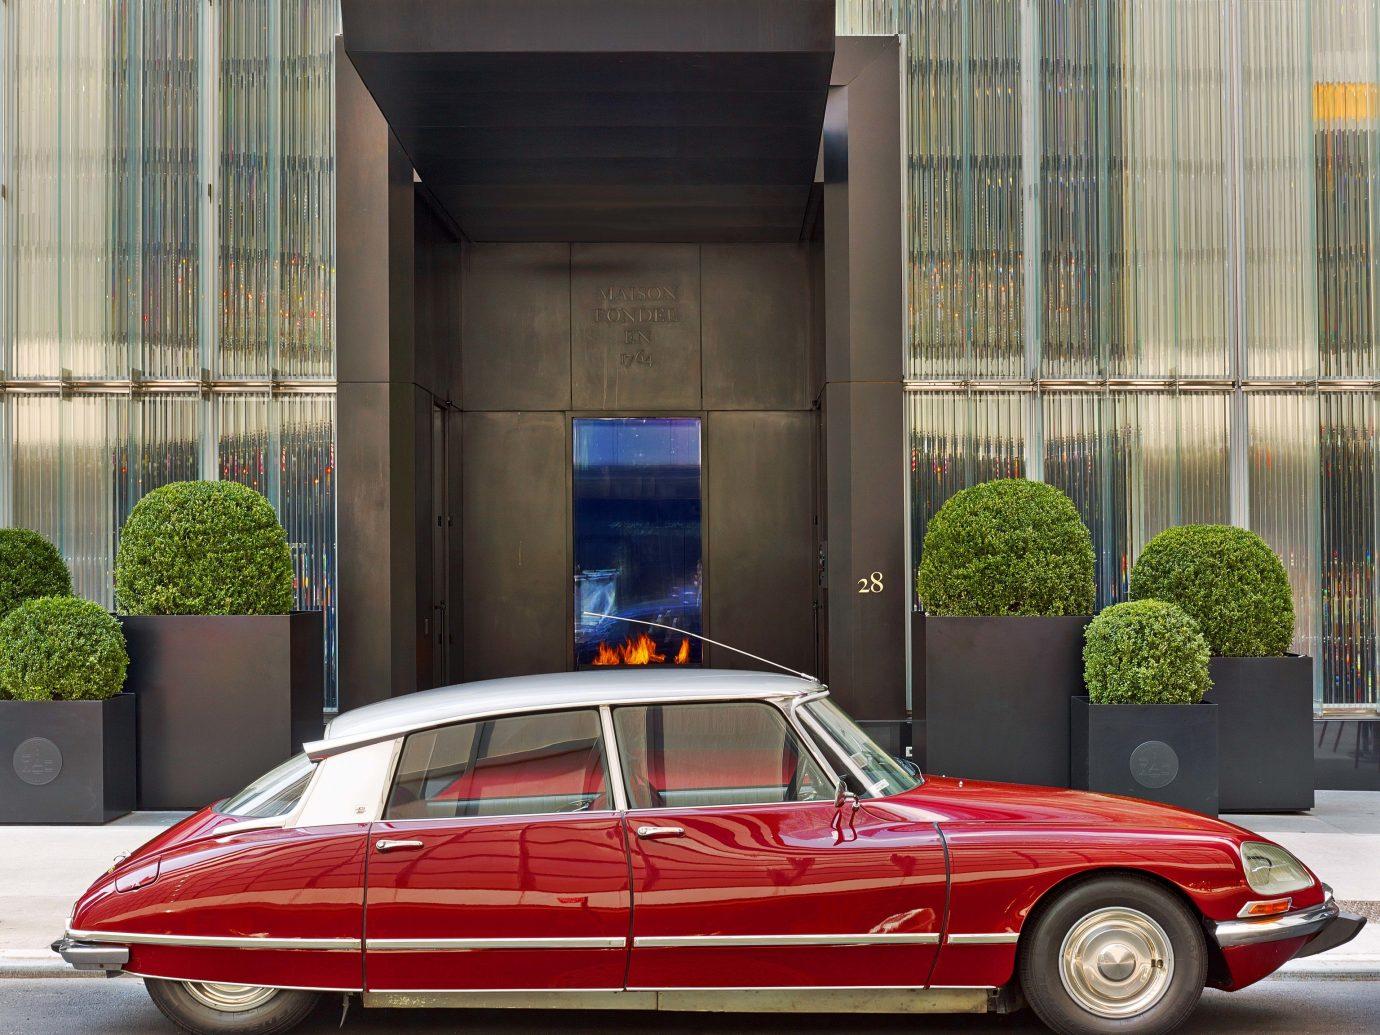 Hotels NYC Offbeat building outdoor car vehicle land vehicle red luxury vehicle automotive design automobile make automotive exterior parked sedan performance car antique car Classic vintage car curb